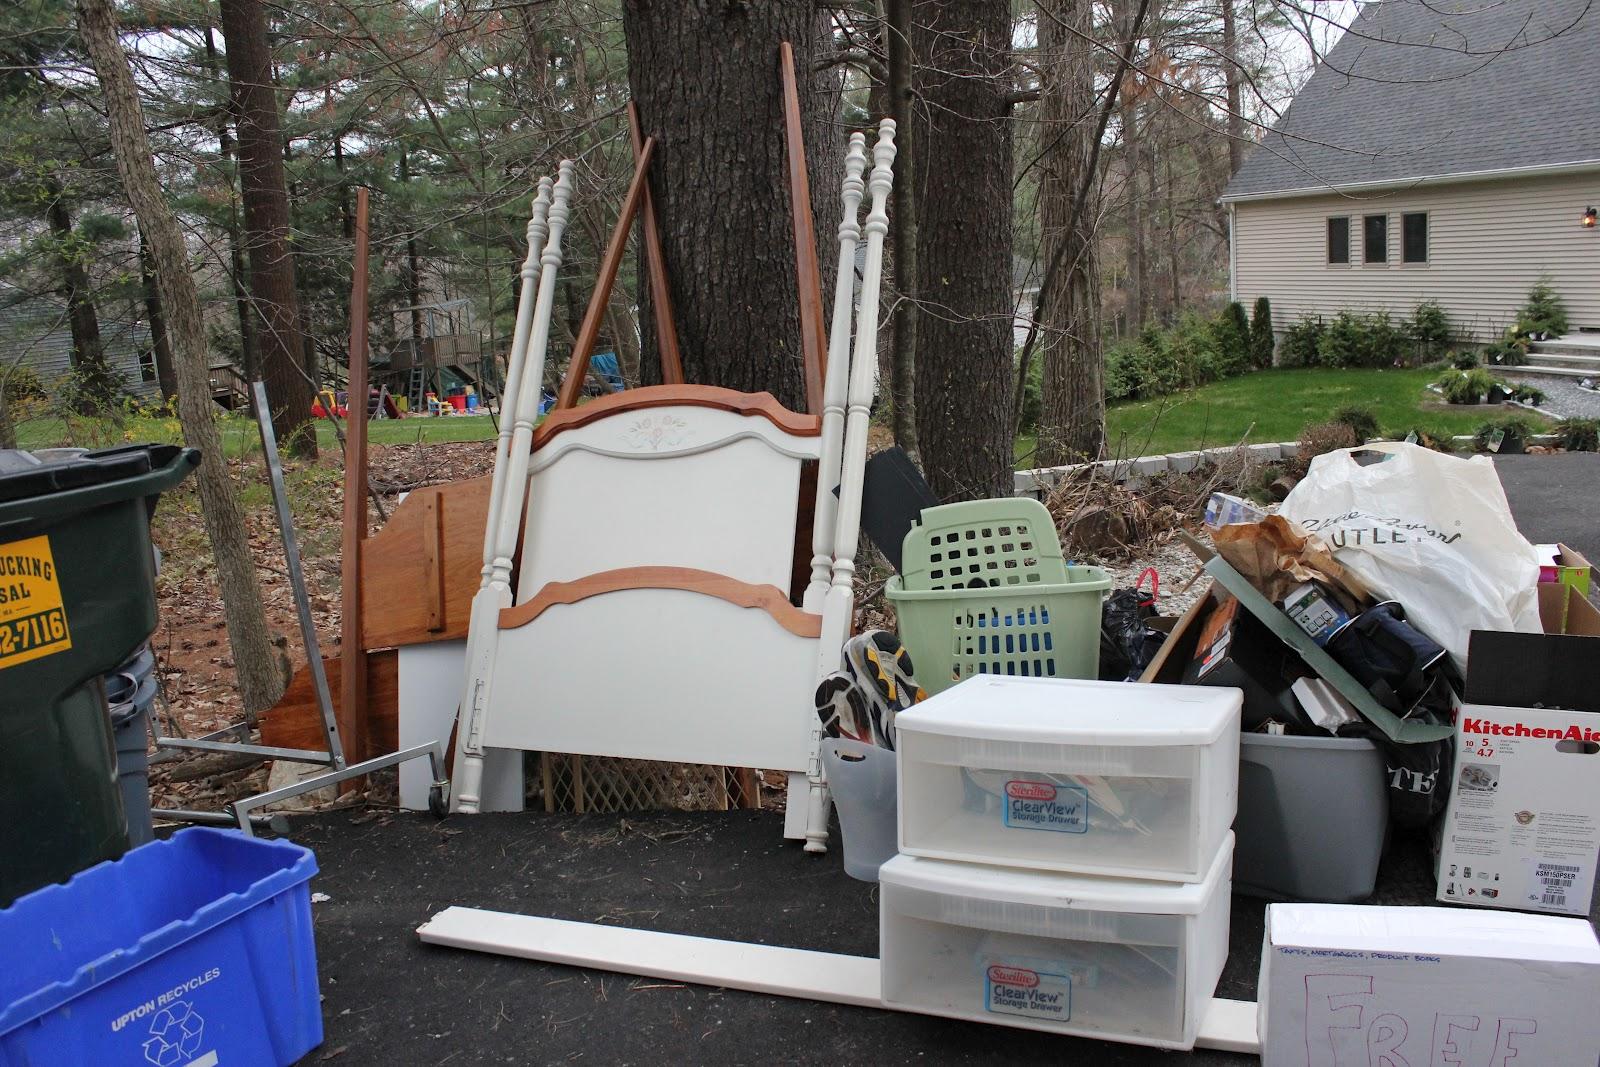 Hailey S Treasures Curb Alert Canopy Bed